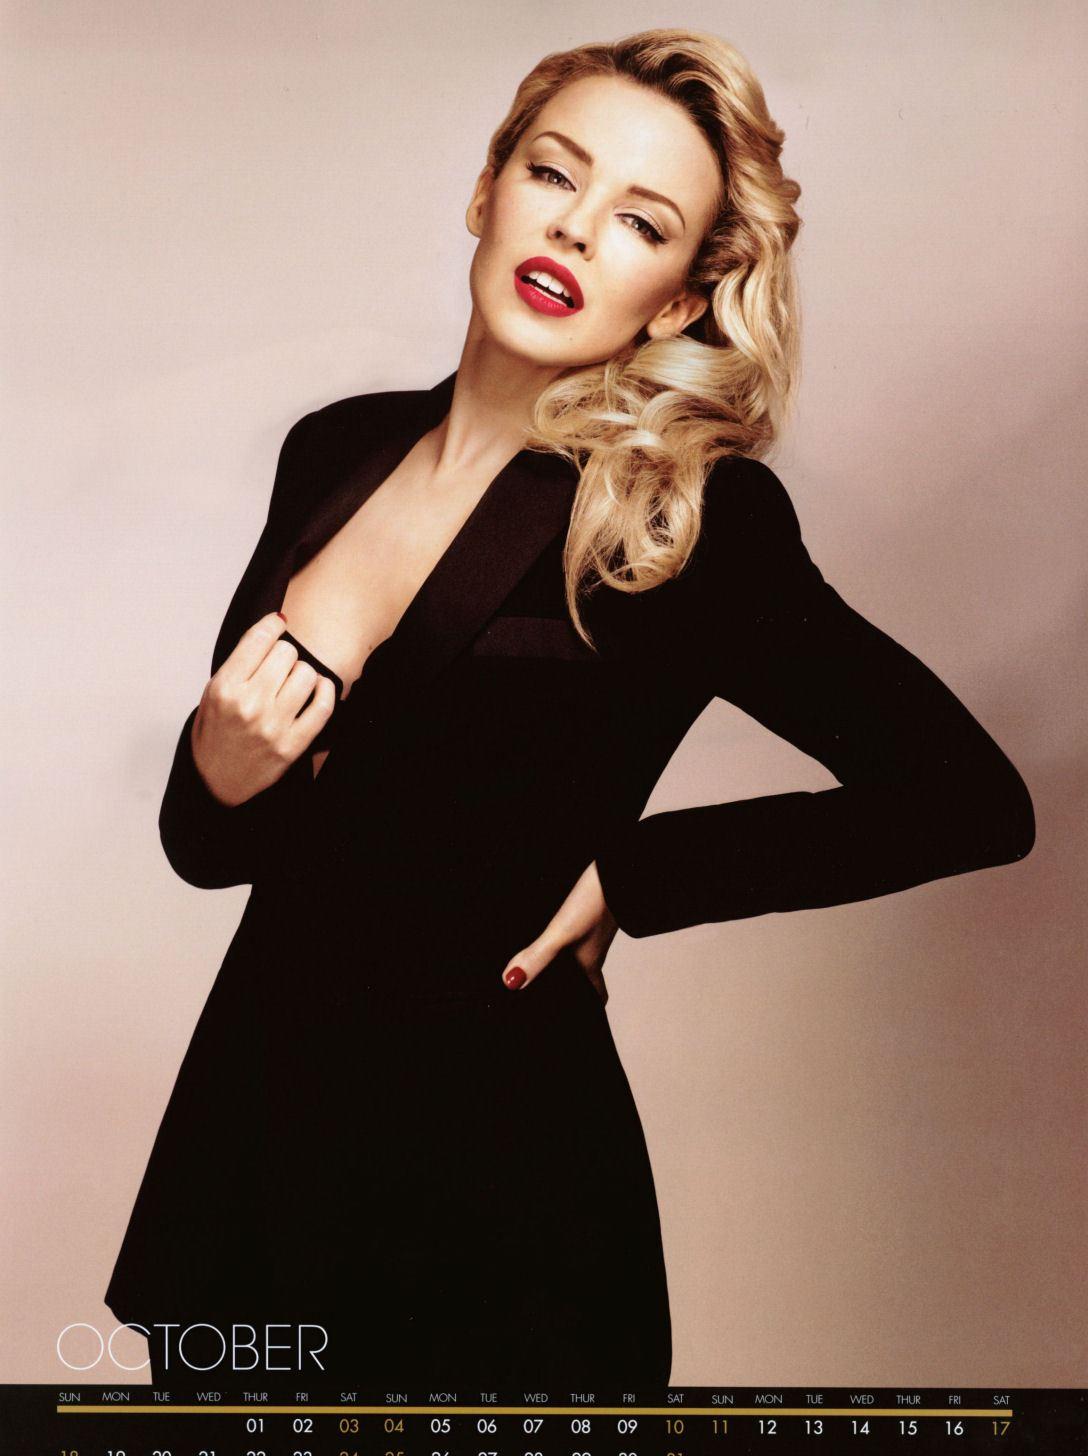 Kylie Minogue Wallpapers 88669 Beautiful Kylie Minogue